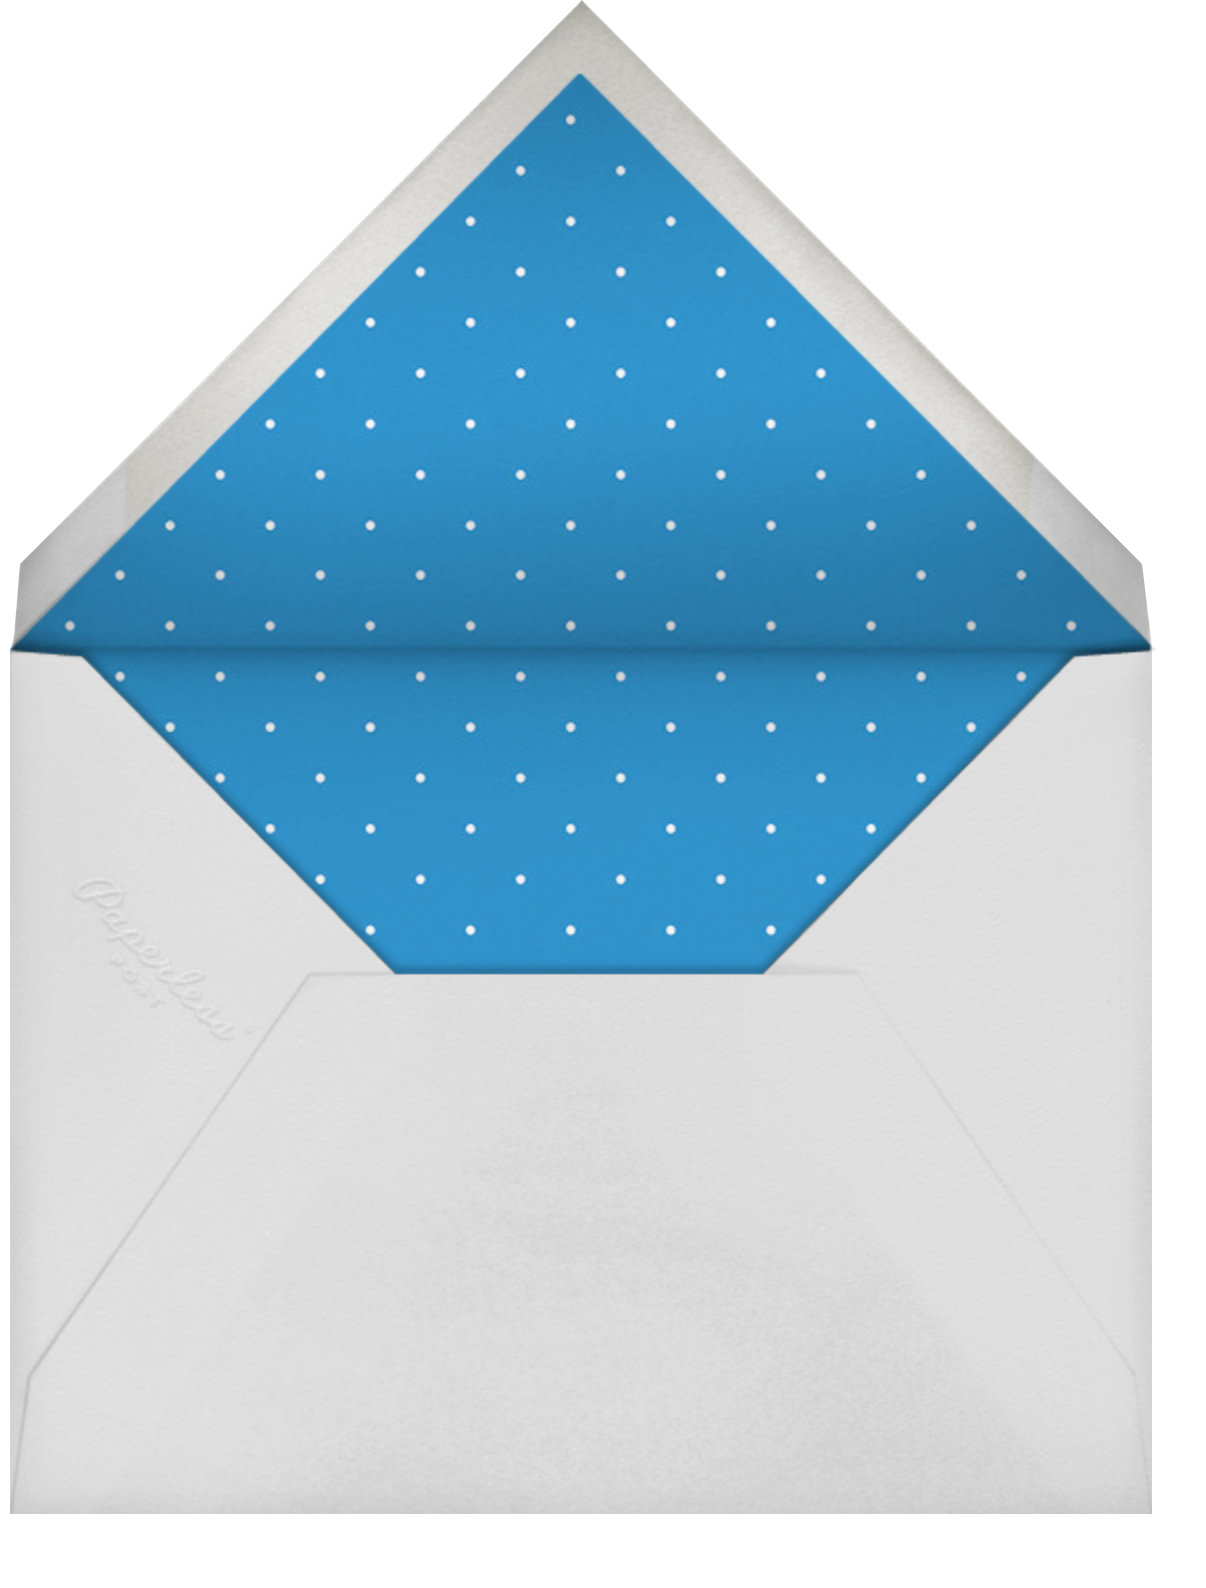 Spec in Capri - Blue - Mr. Boddington's Studio - Bar and bat mitzvah - envelope back